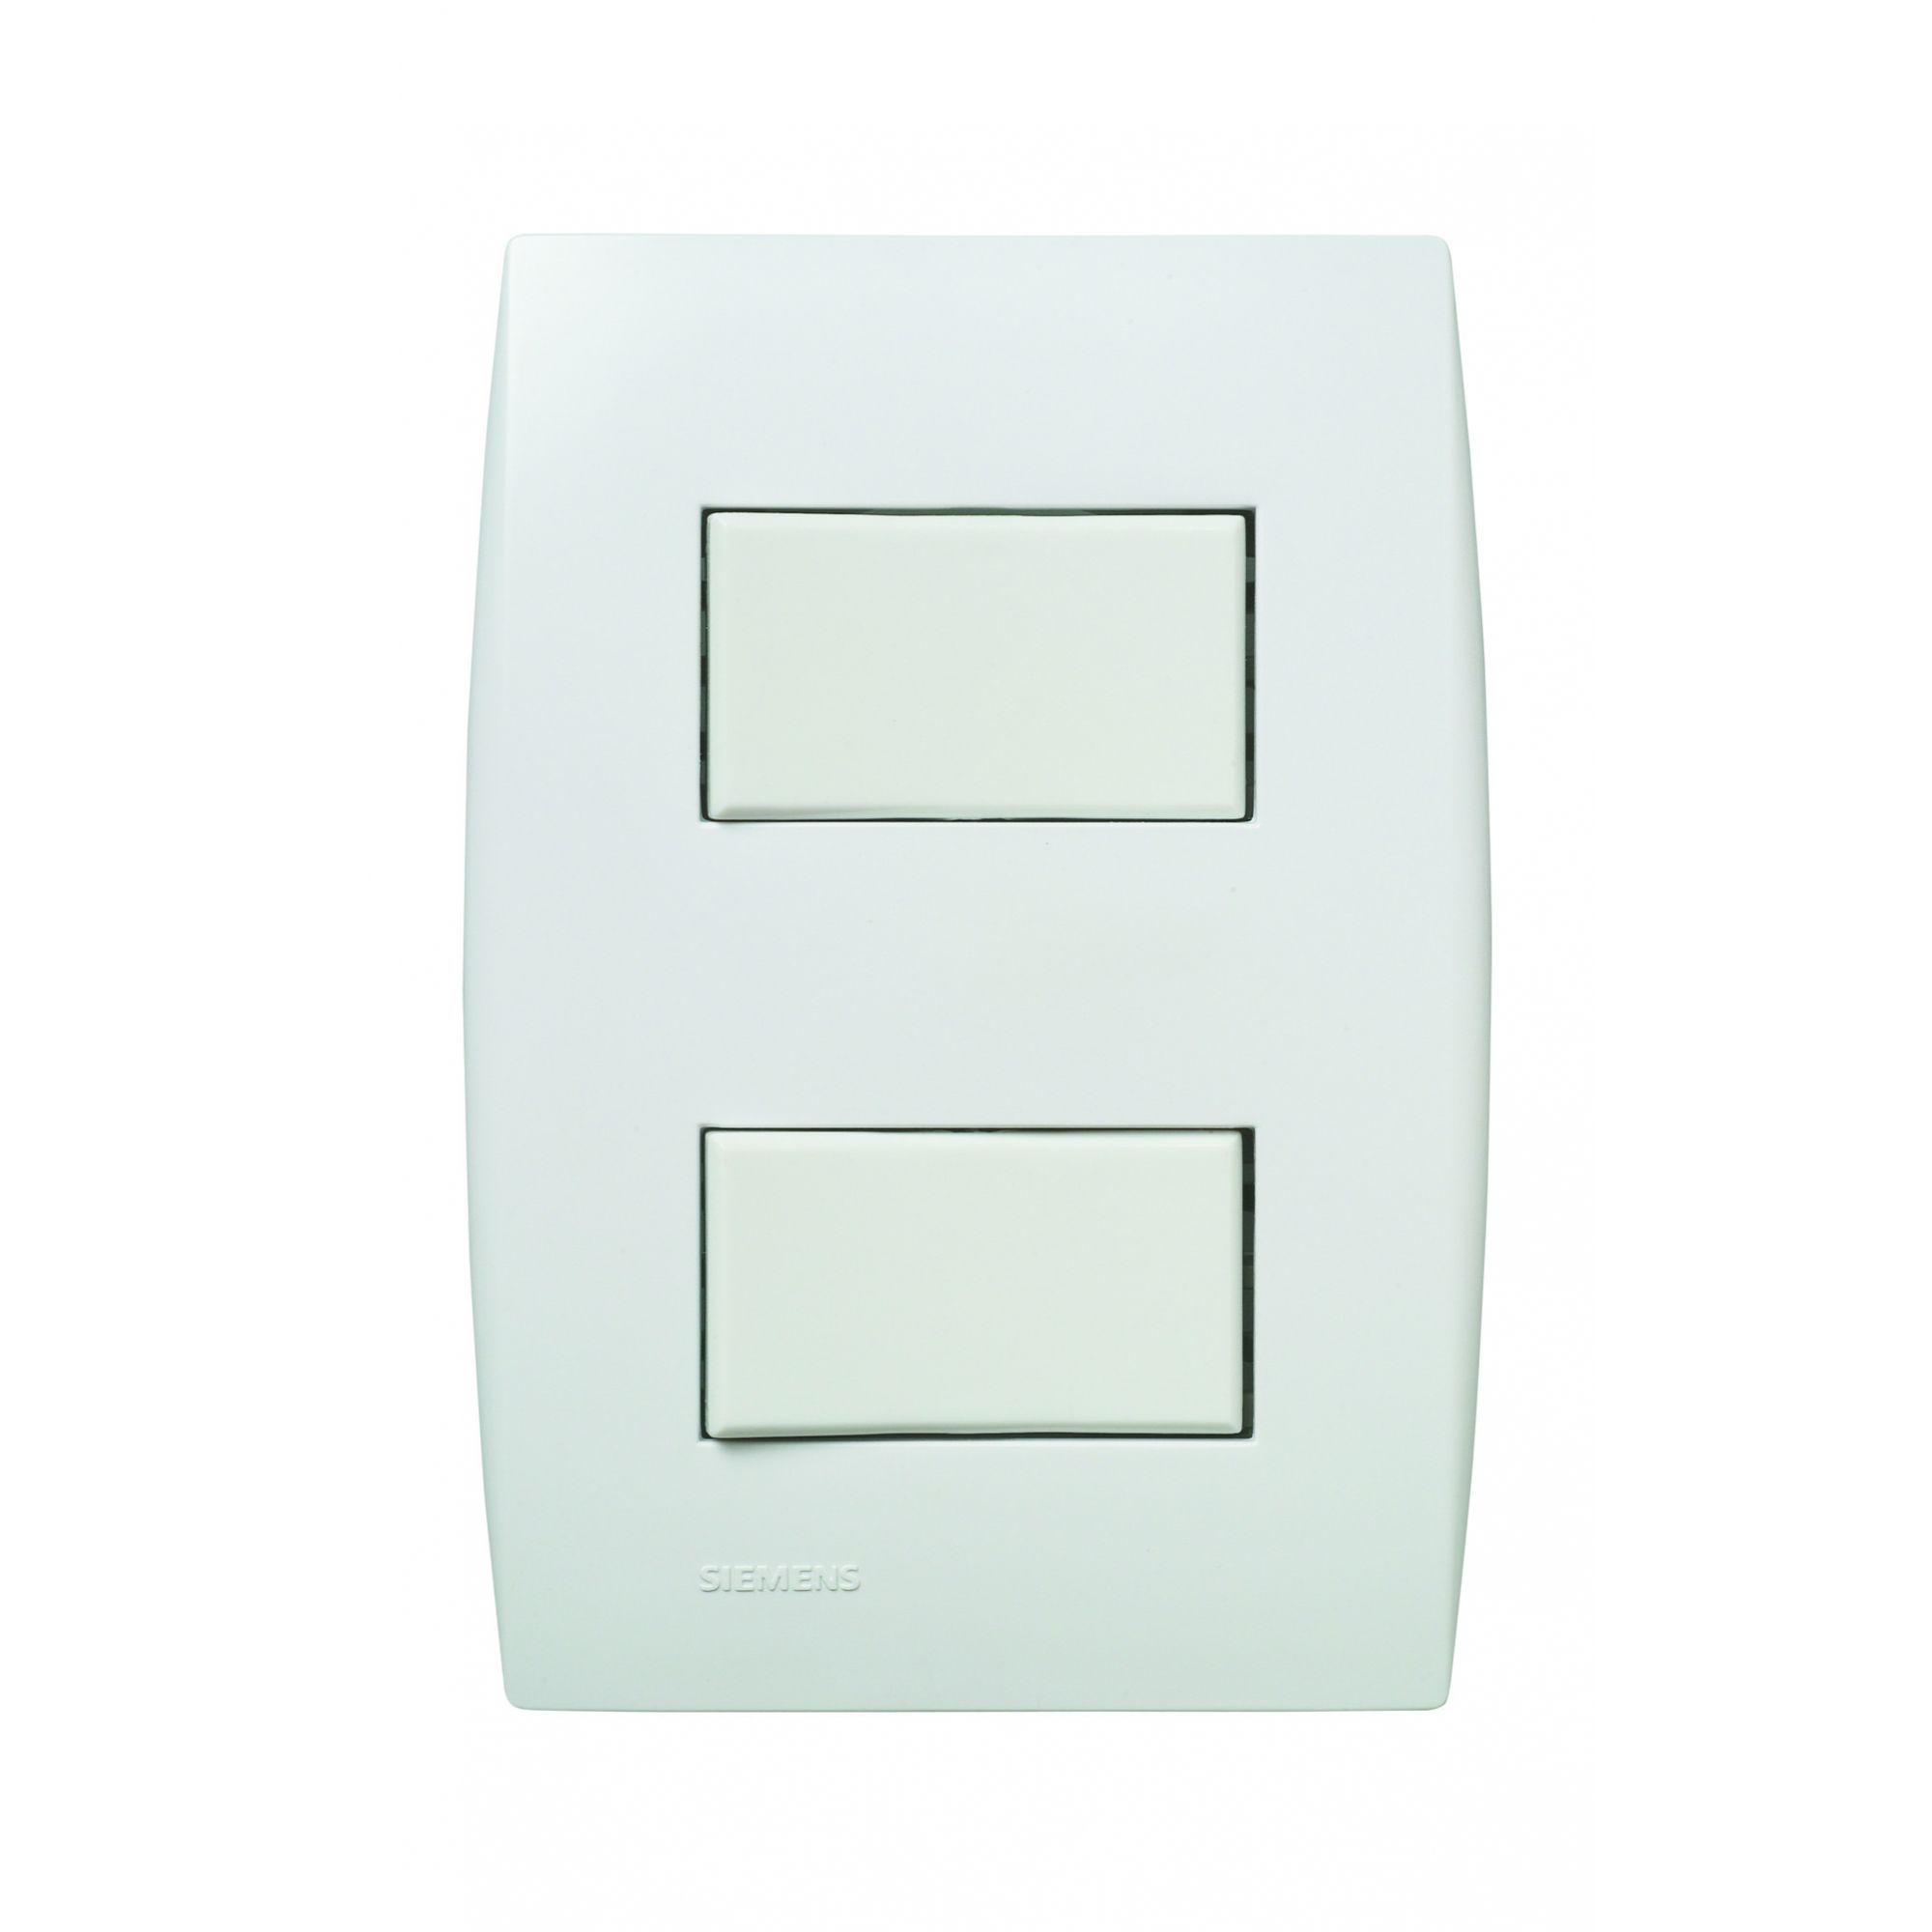 Conjunto 2 Interruptores Paralelos Ilus